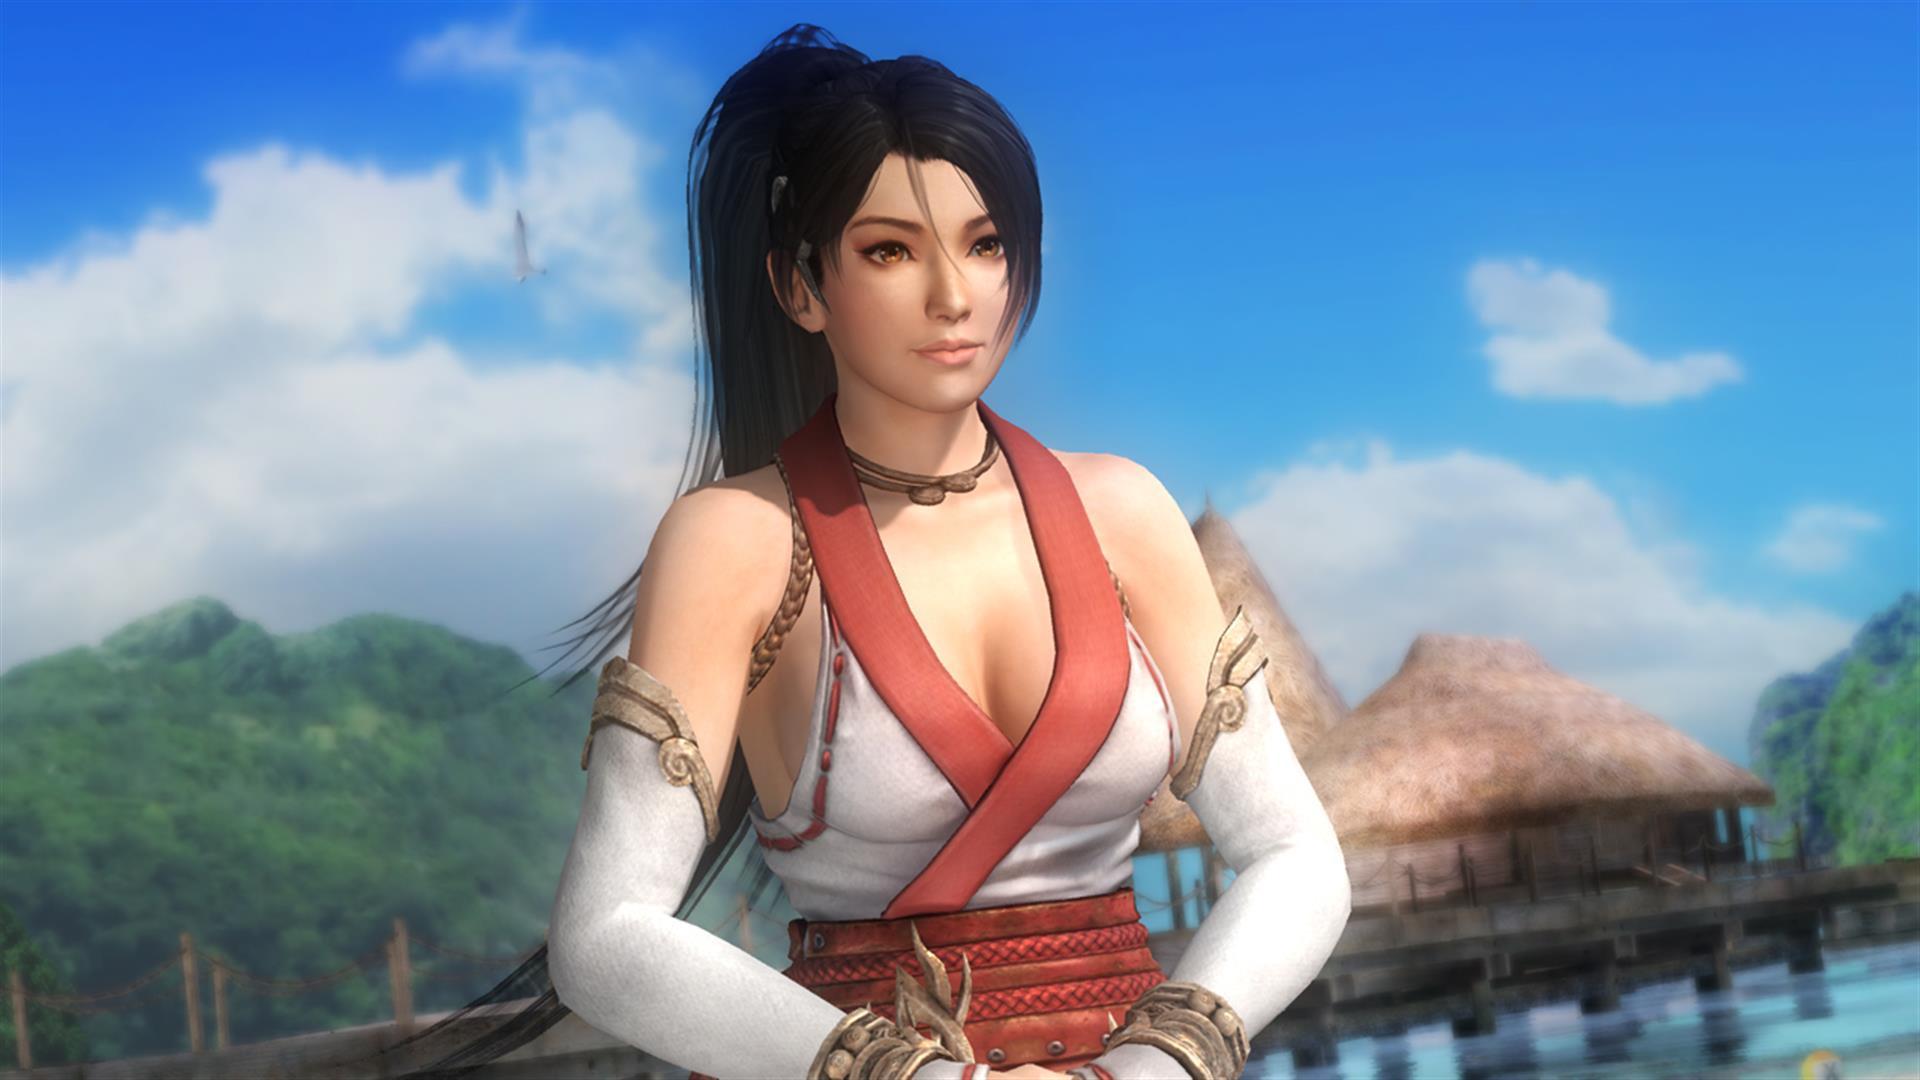 Momiji จาก Ninja Gaiden จะเข้าร่วมศึก Dead or Alive 6